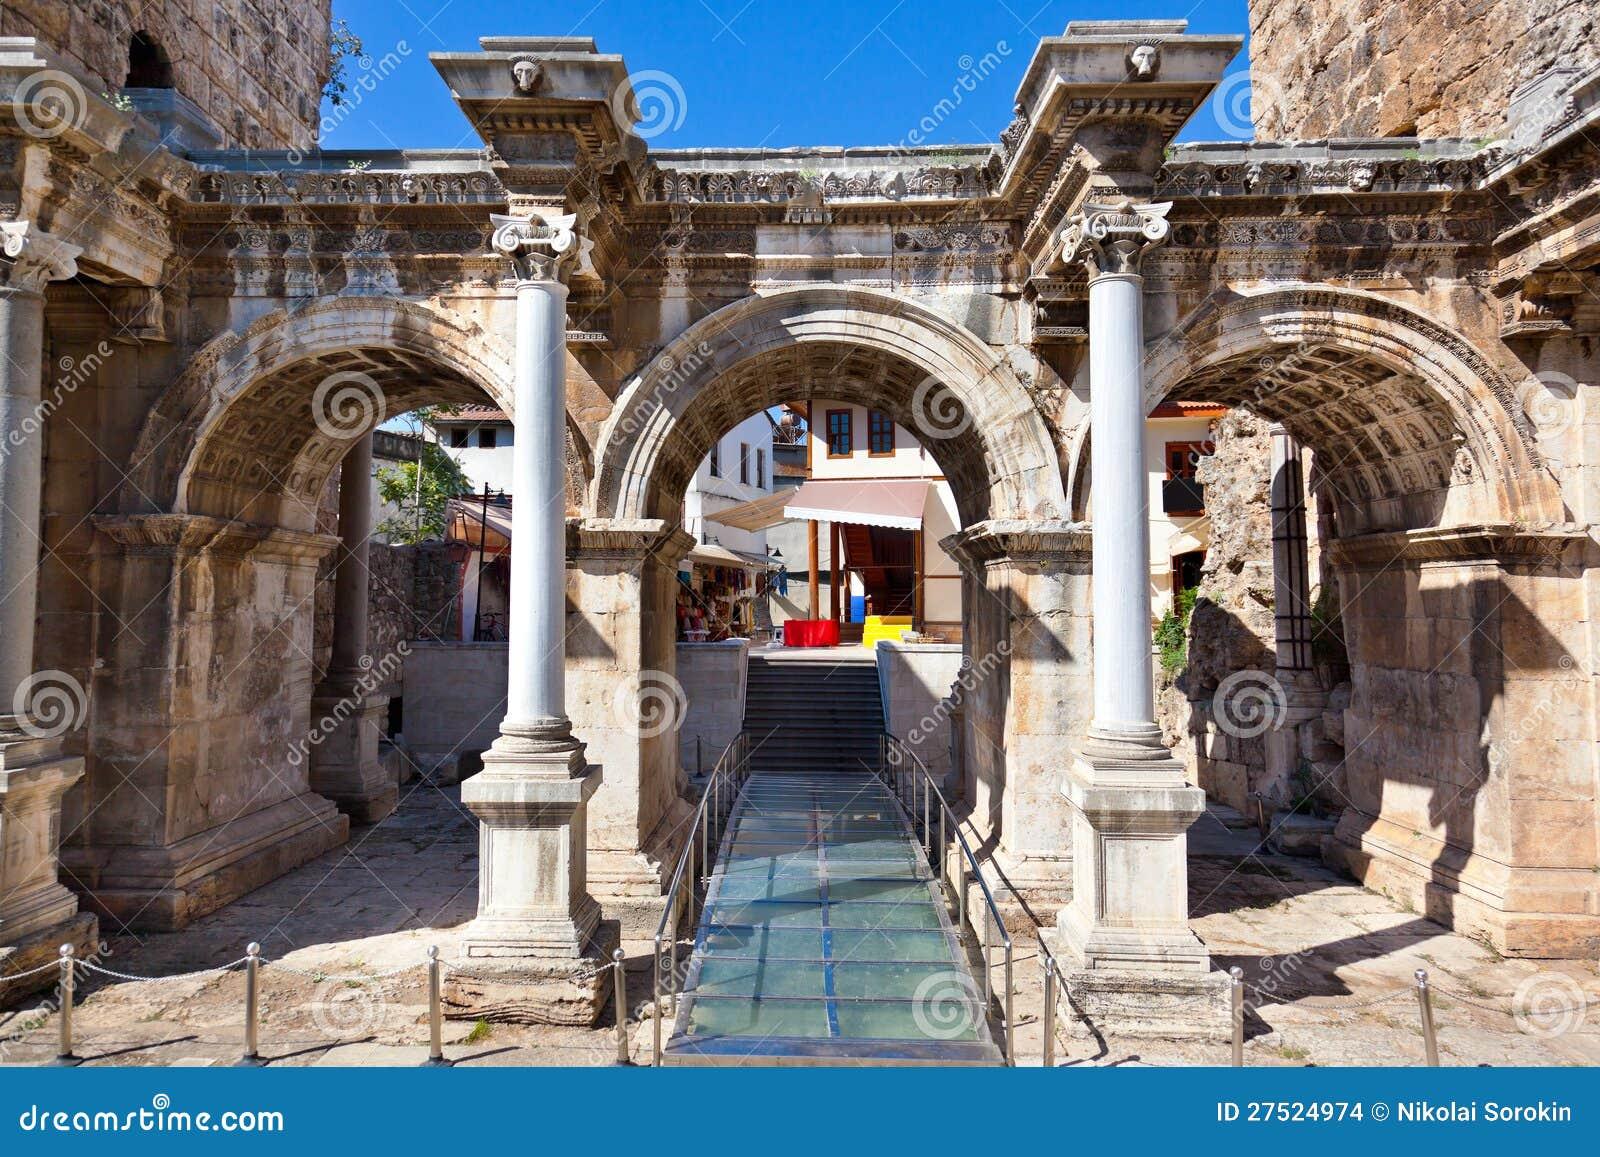 Oude Stad Kaleici In Antalya Turkije Stock Afbeeldingen ...